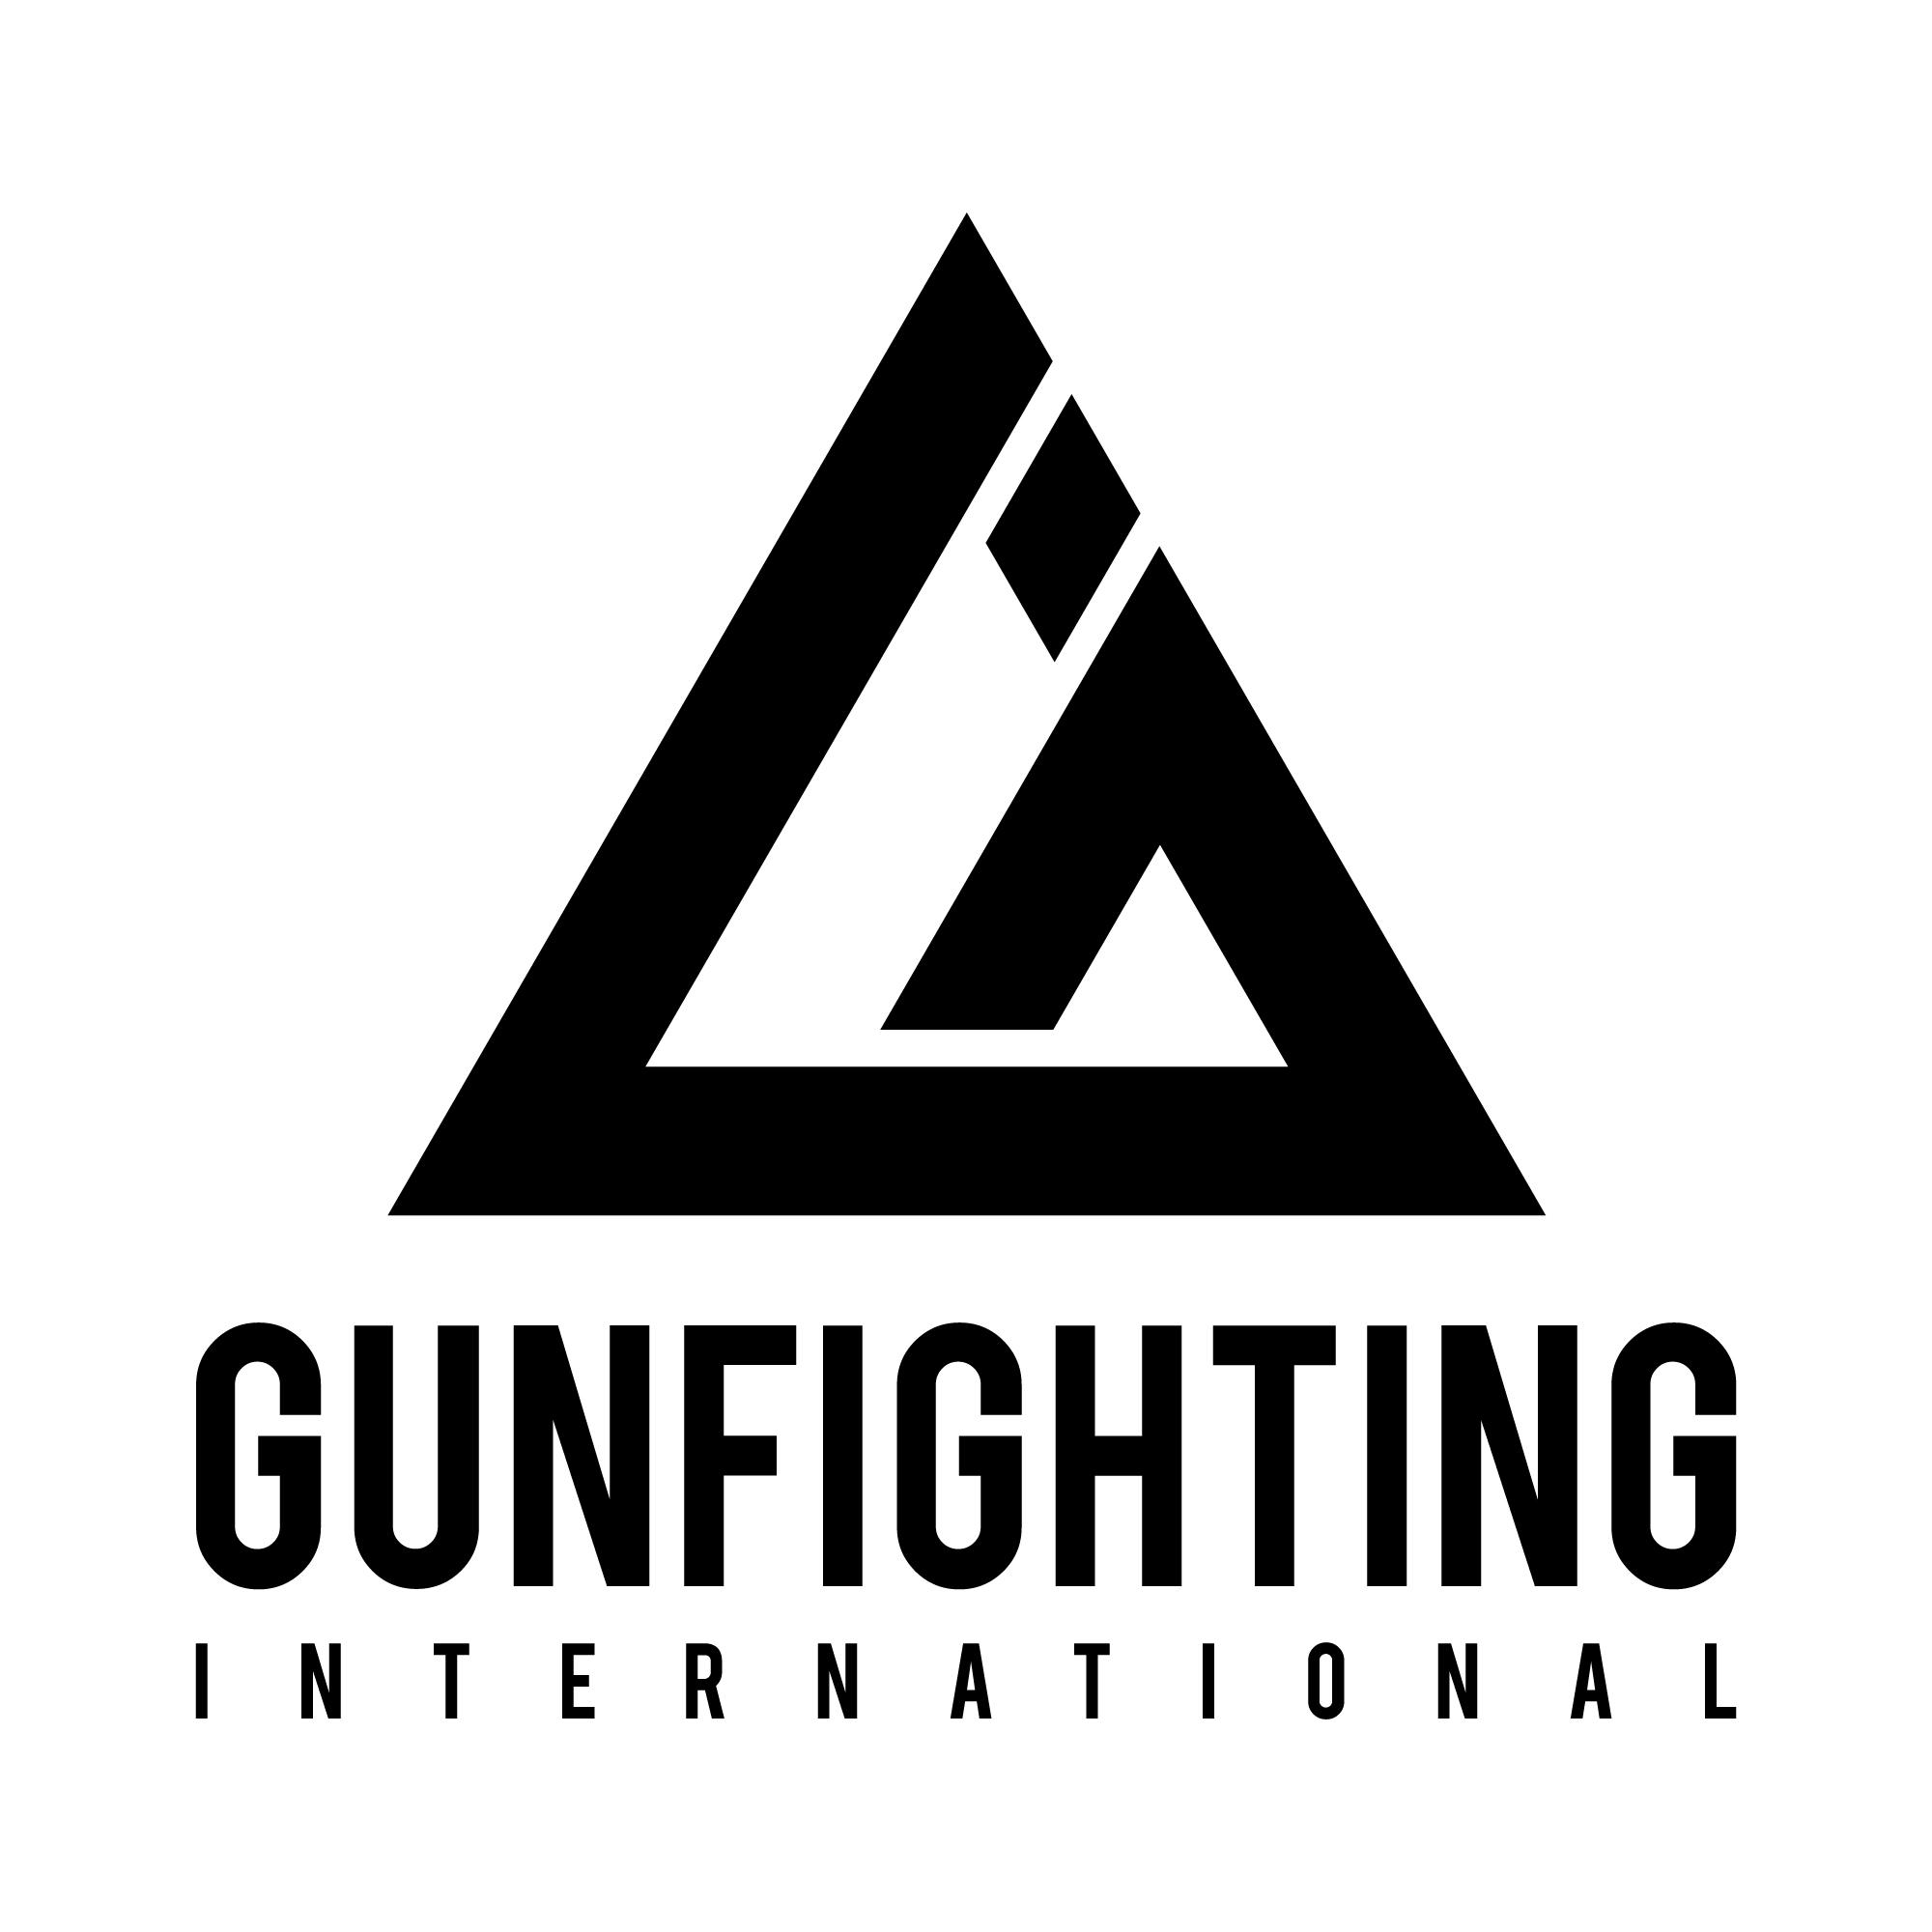 Pistol Gunfighting Techniques